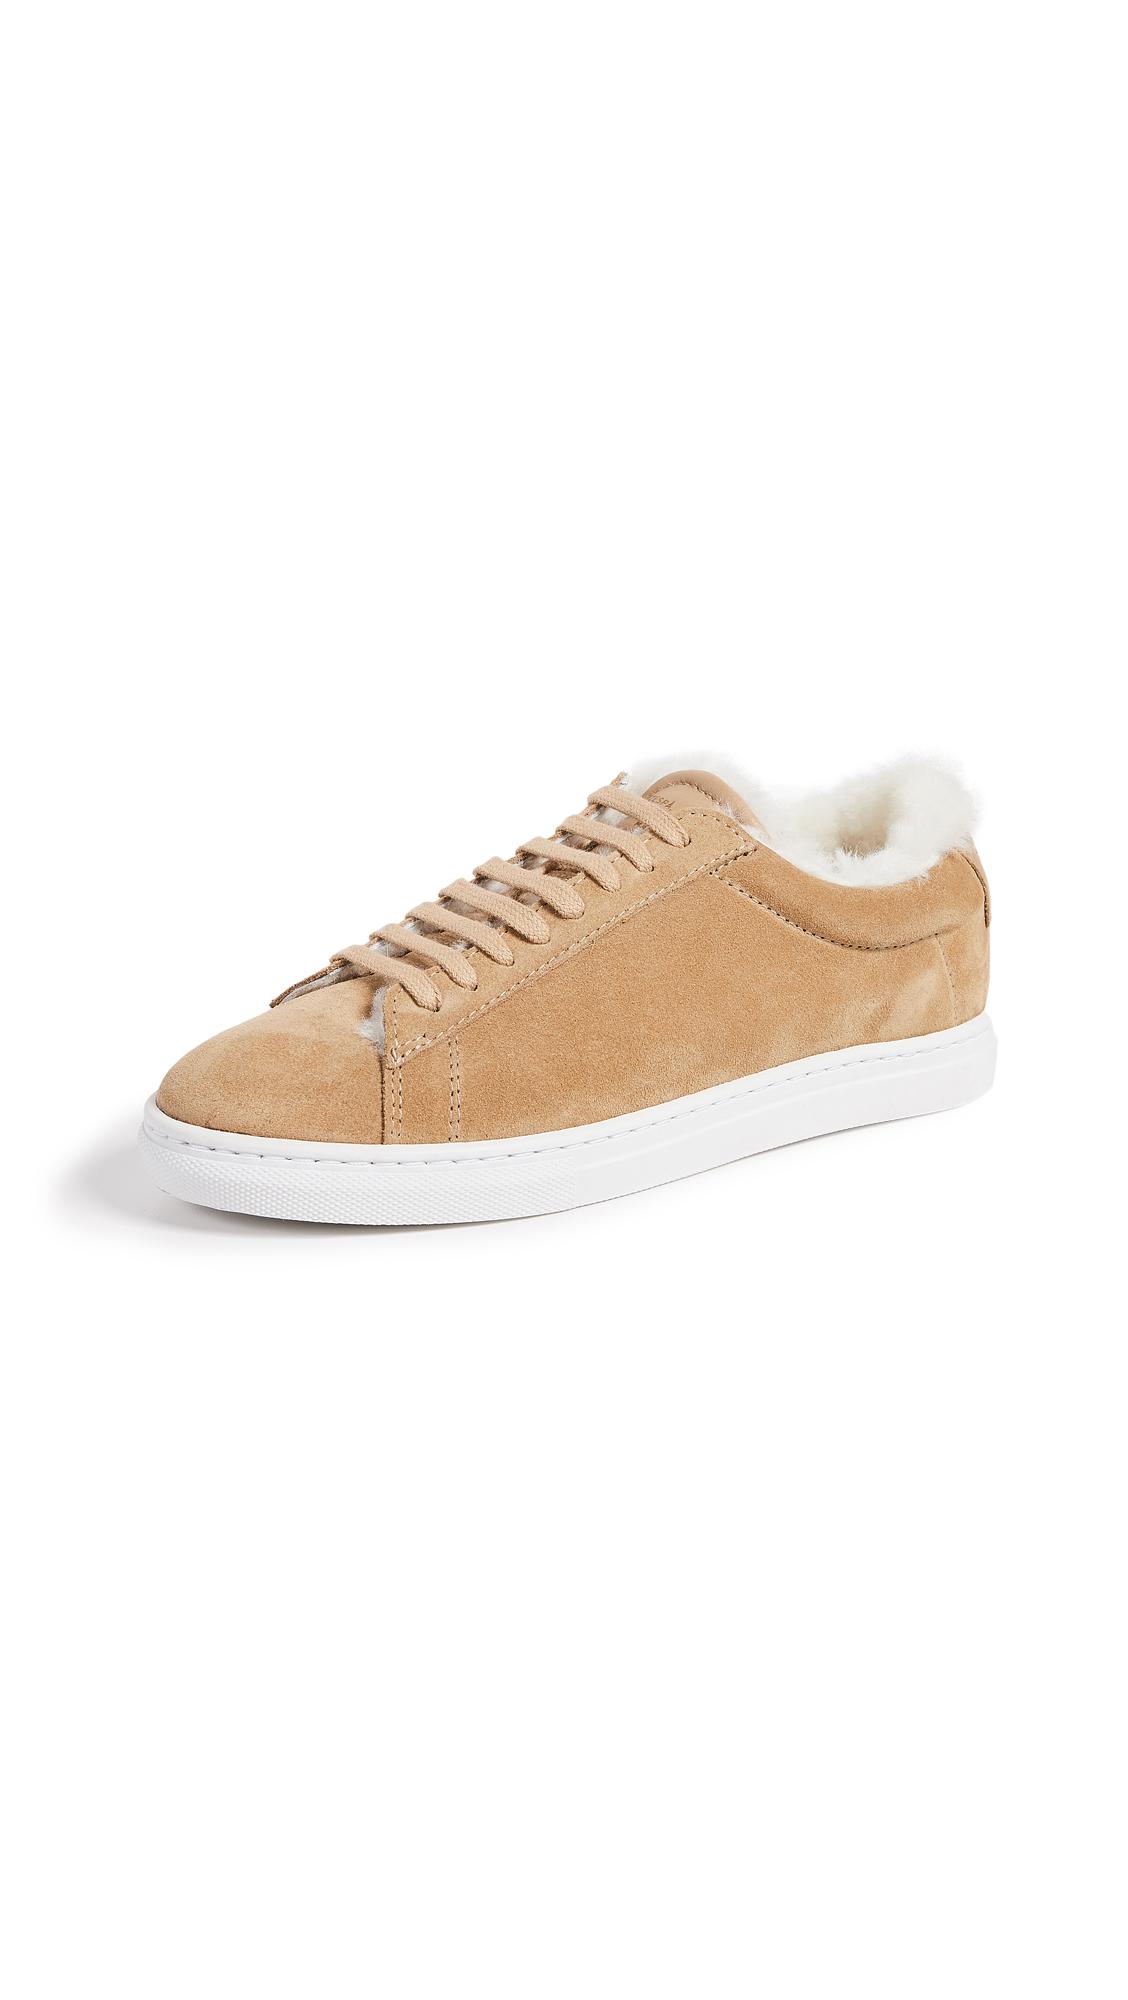 Zespa Suede Biscuit Shearling Sneakers